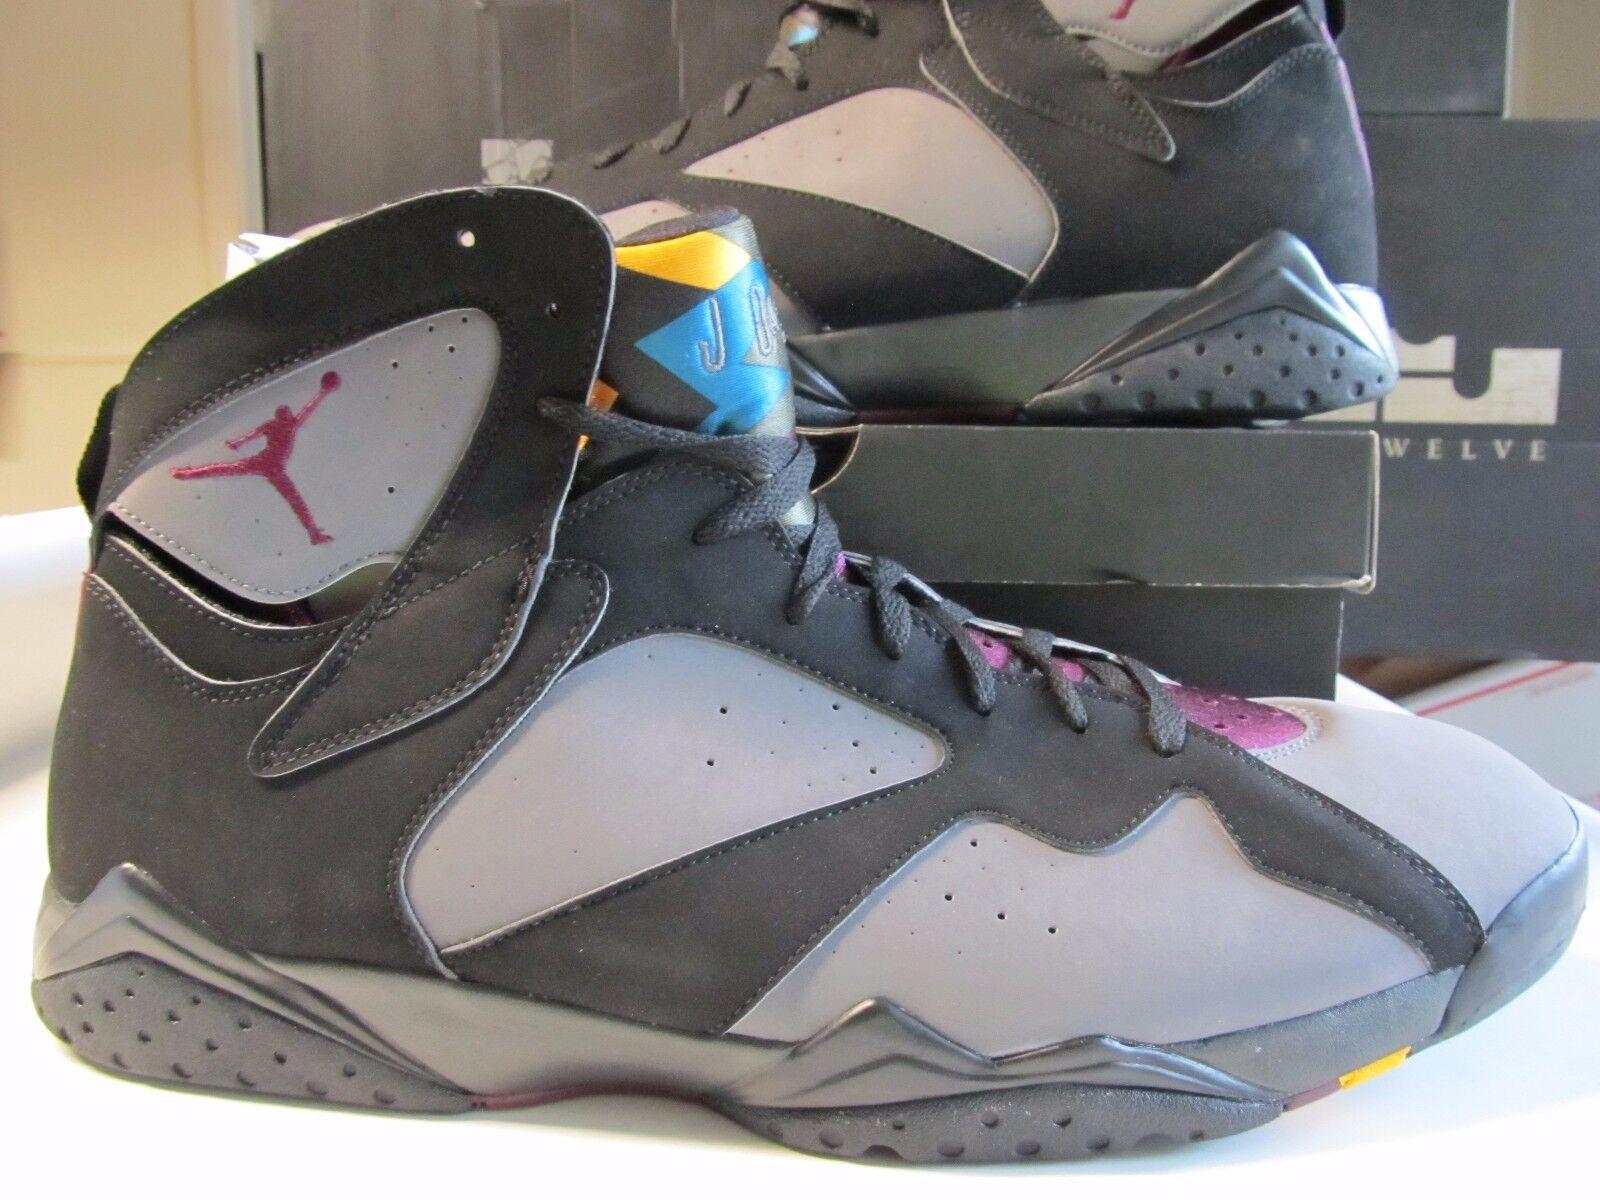 Nike Air Jordan Retro 7 VII Bordeaux Schwarz Graphit Nebel Grau 18 304775 034 Abrechnungspreis